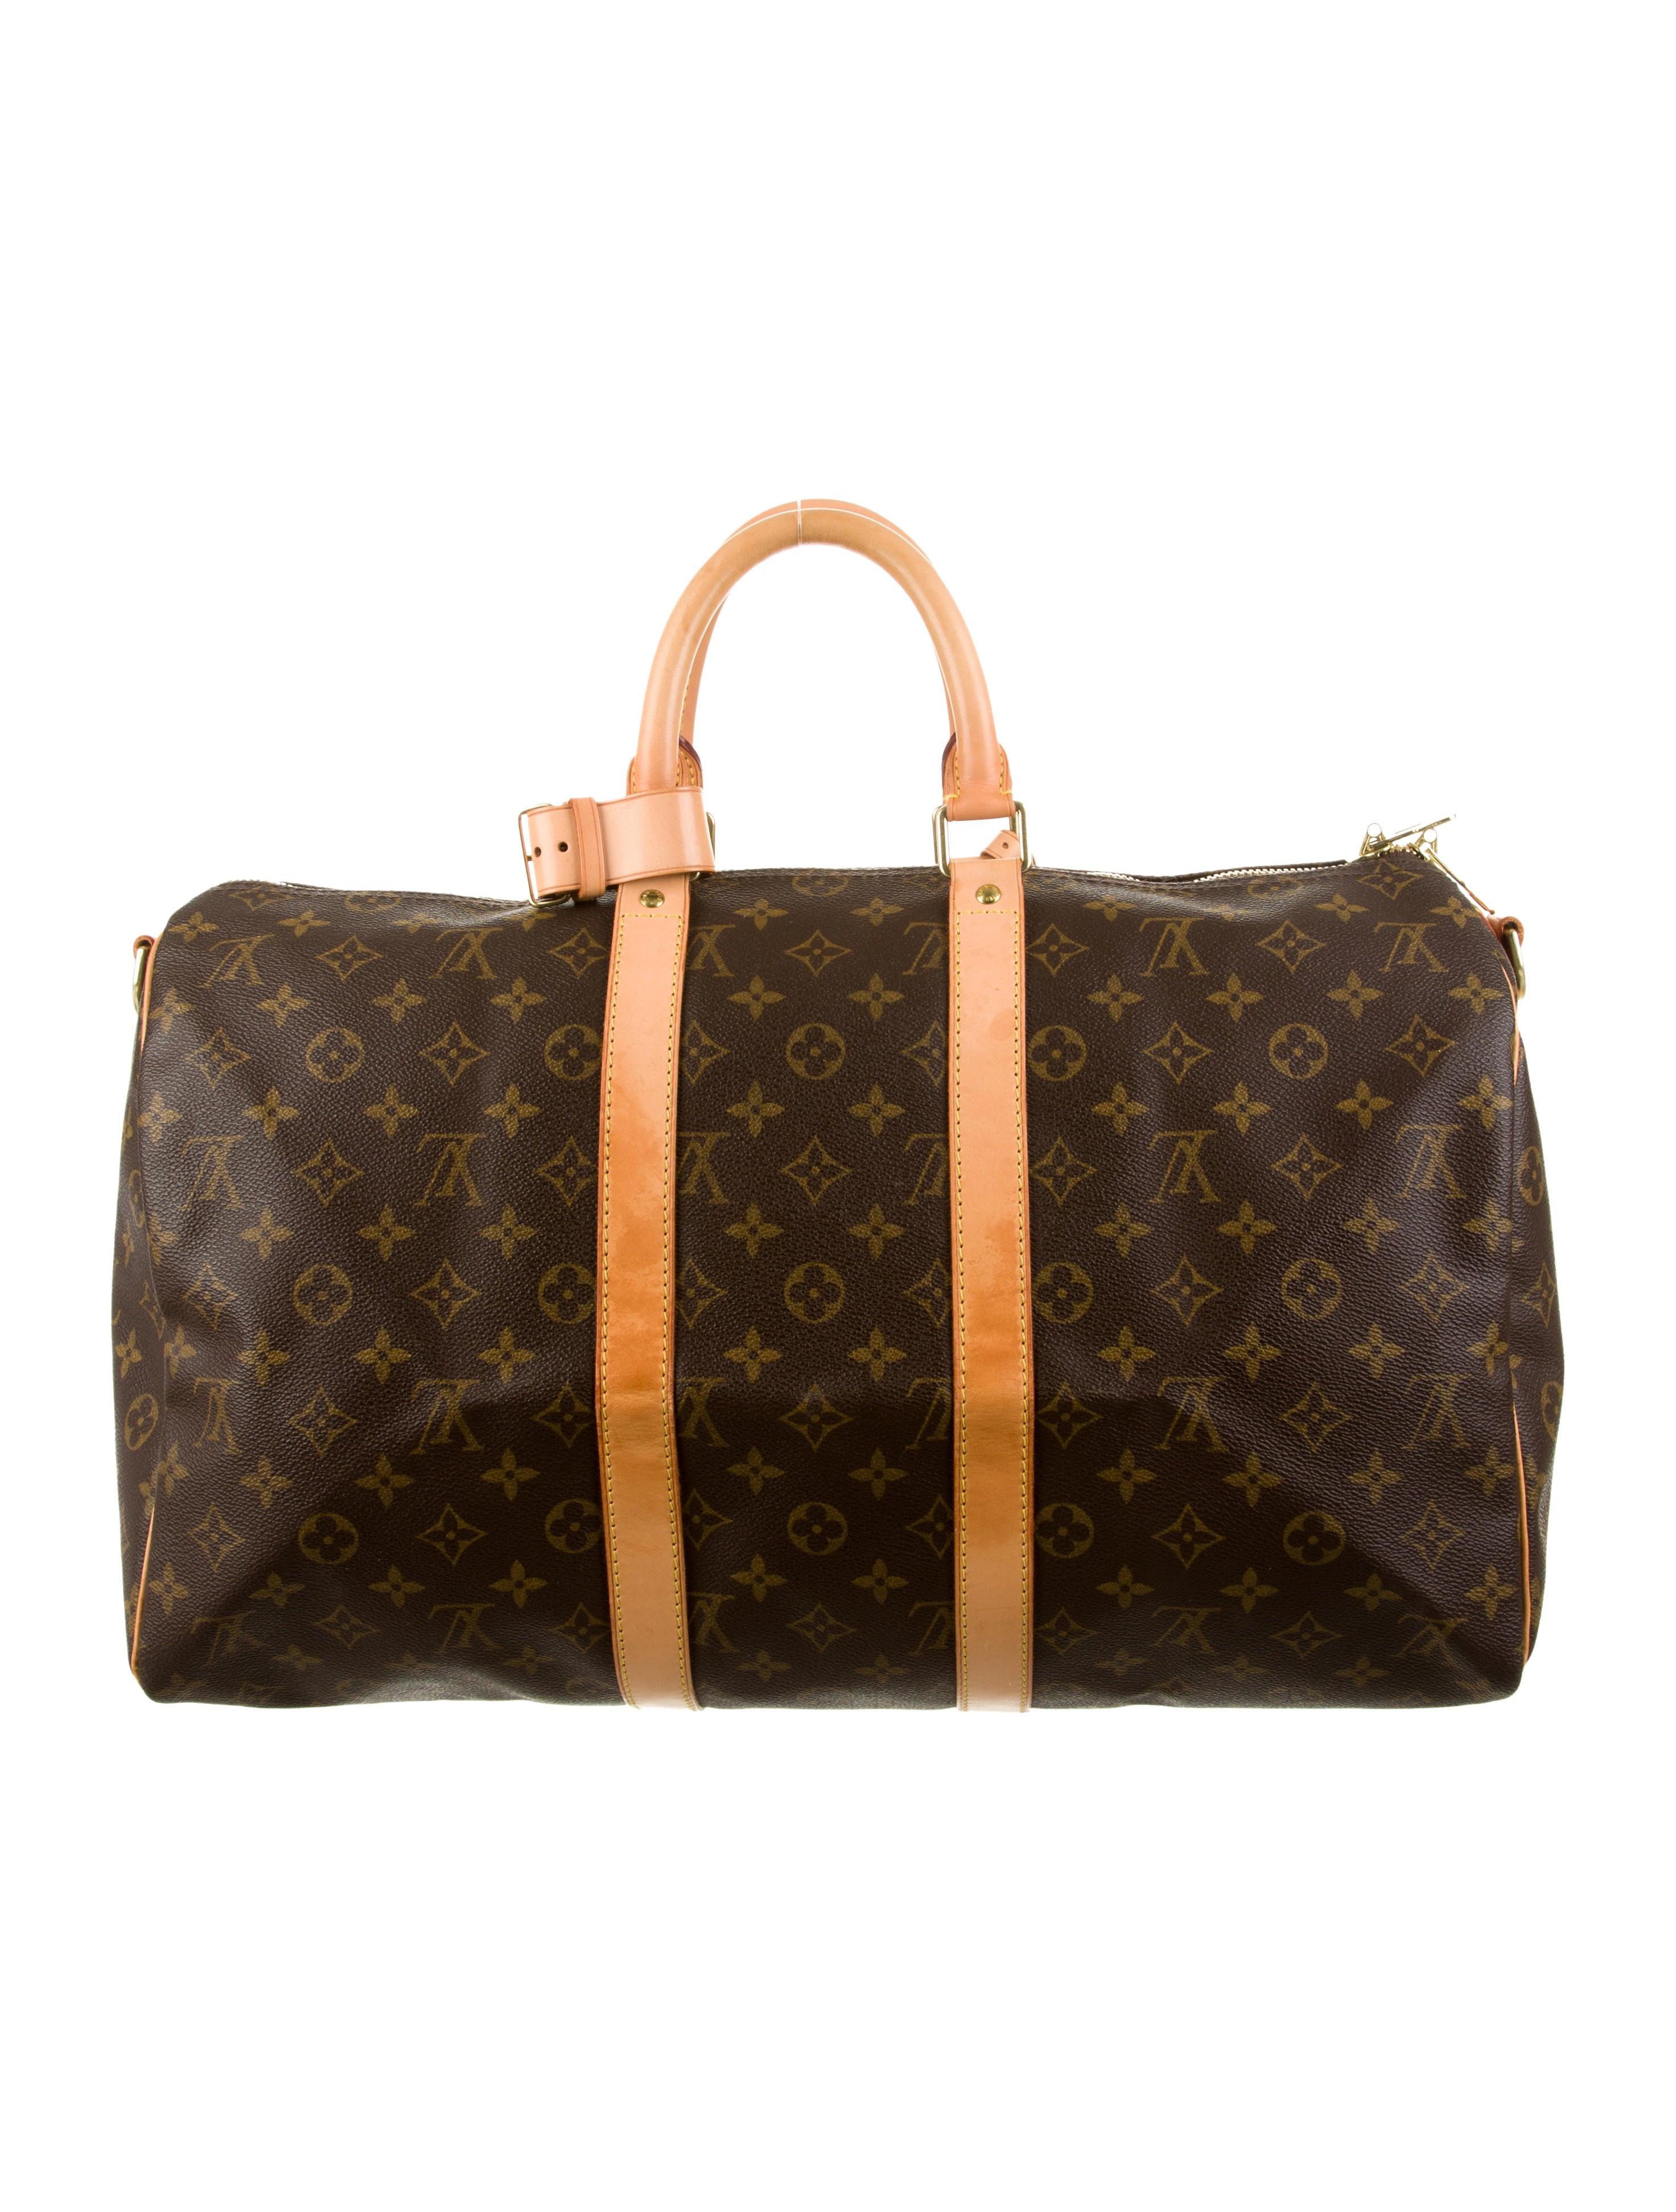 louis vuitton keepall bandouli re 45 handbags lou57321. Black Bedroom Furniture Sets. Home Design Ideas